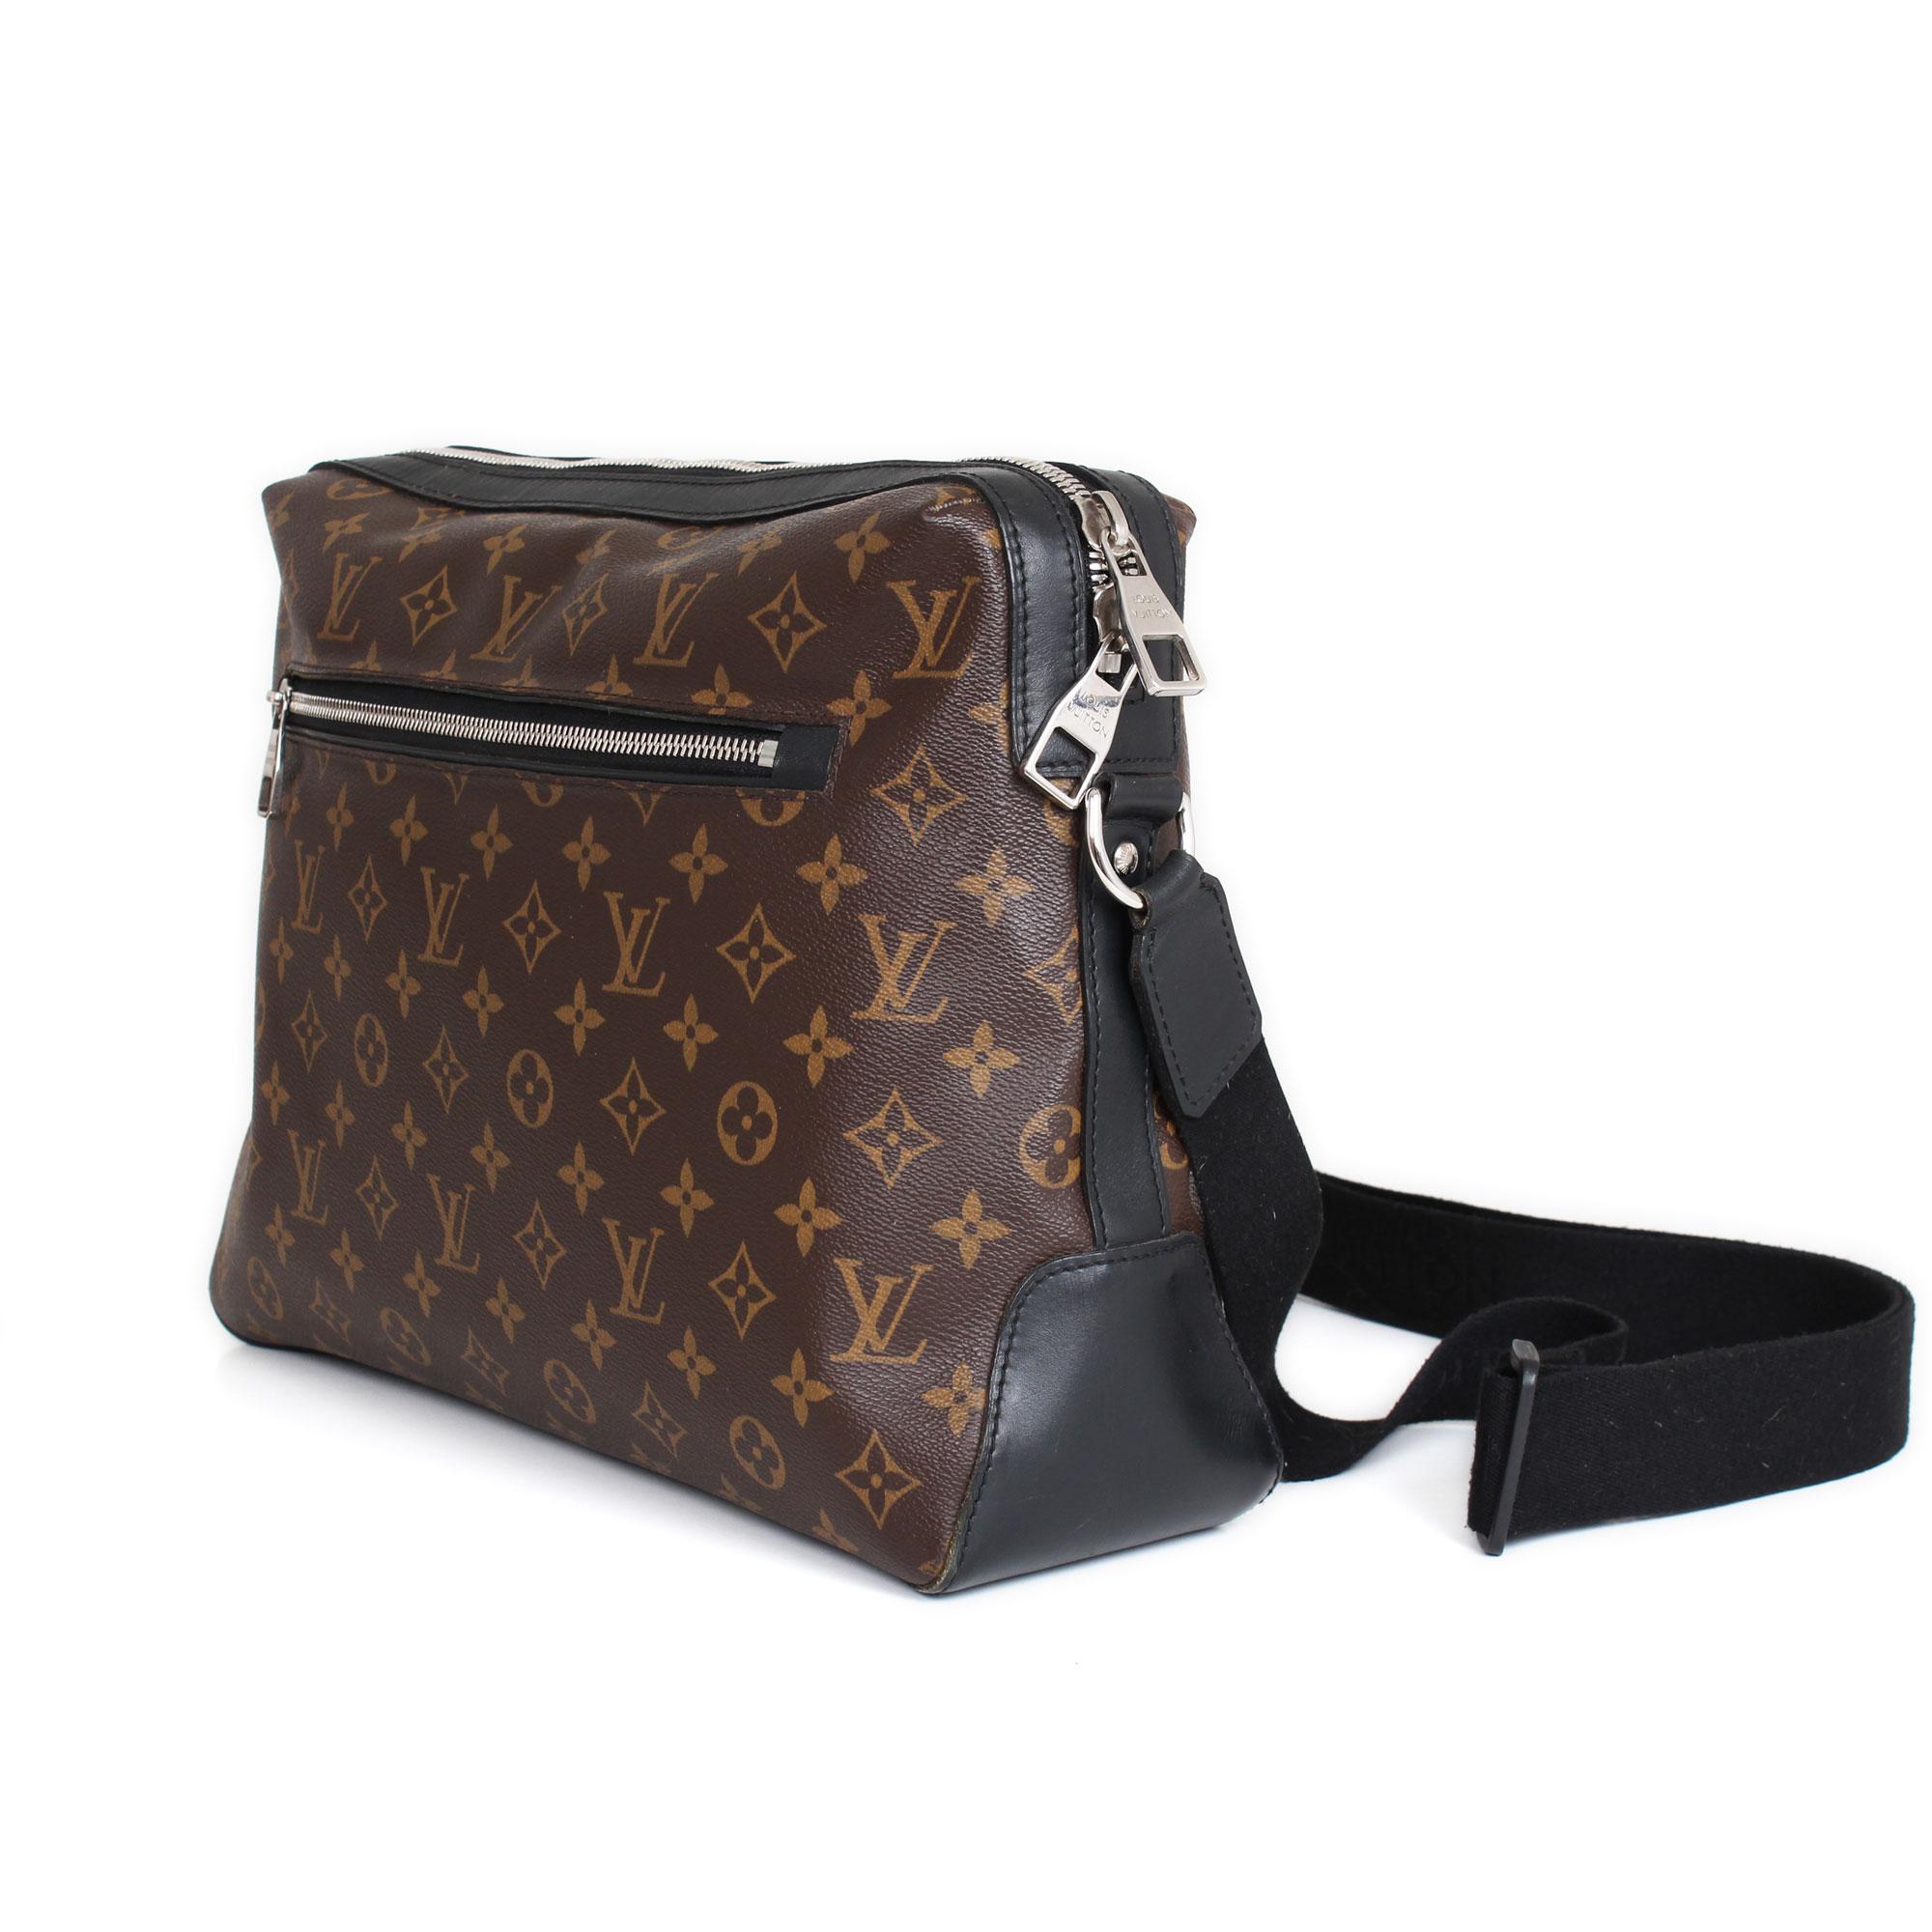 72b4a0323880 Louis Vuitton Torres Monogram and Macasar Messenger Bag